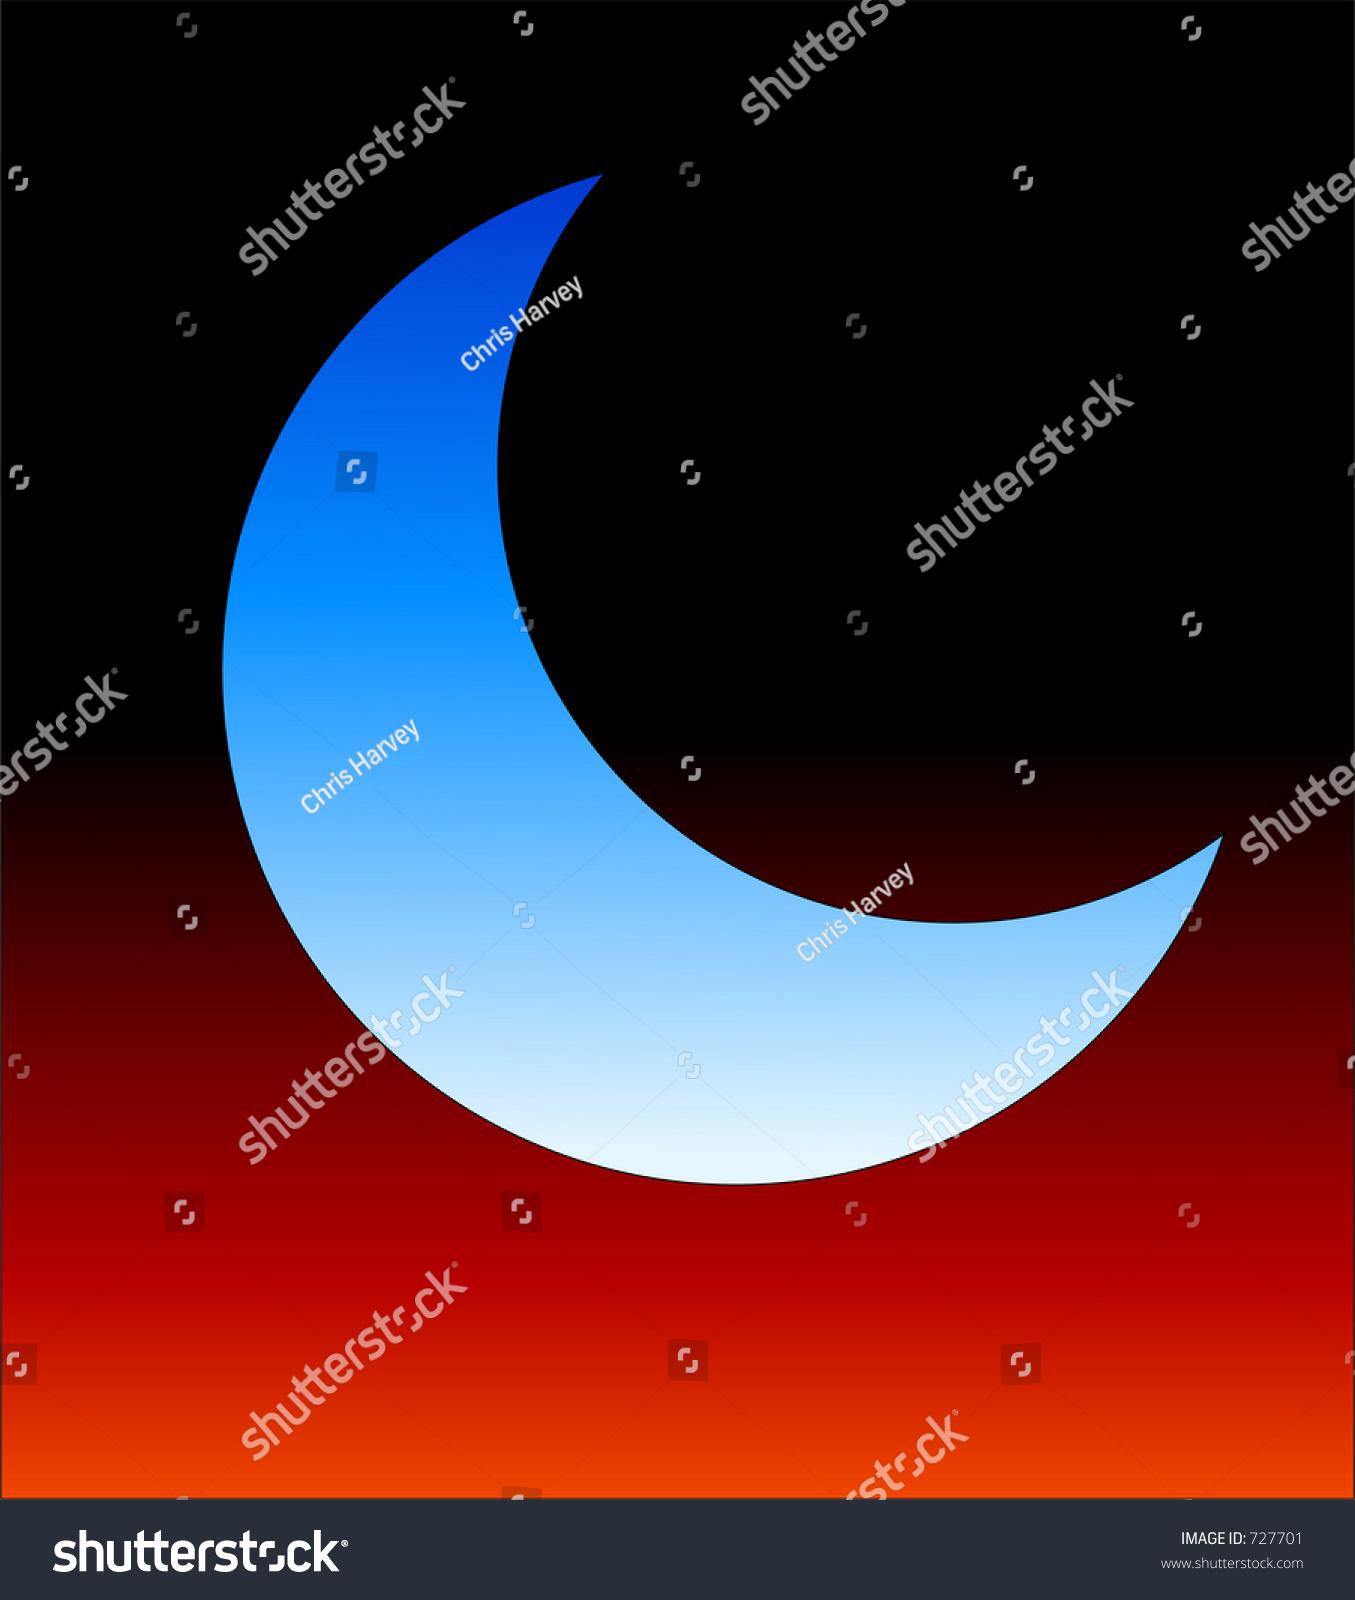 This crescent moon symbol stock illustration 727701 shutterstock this is a crescent moon symbol biocorpaavc Gallery